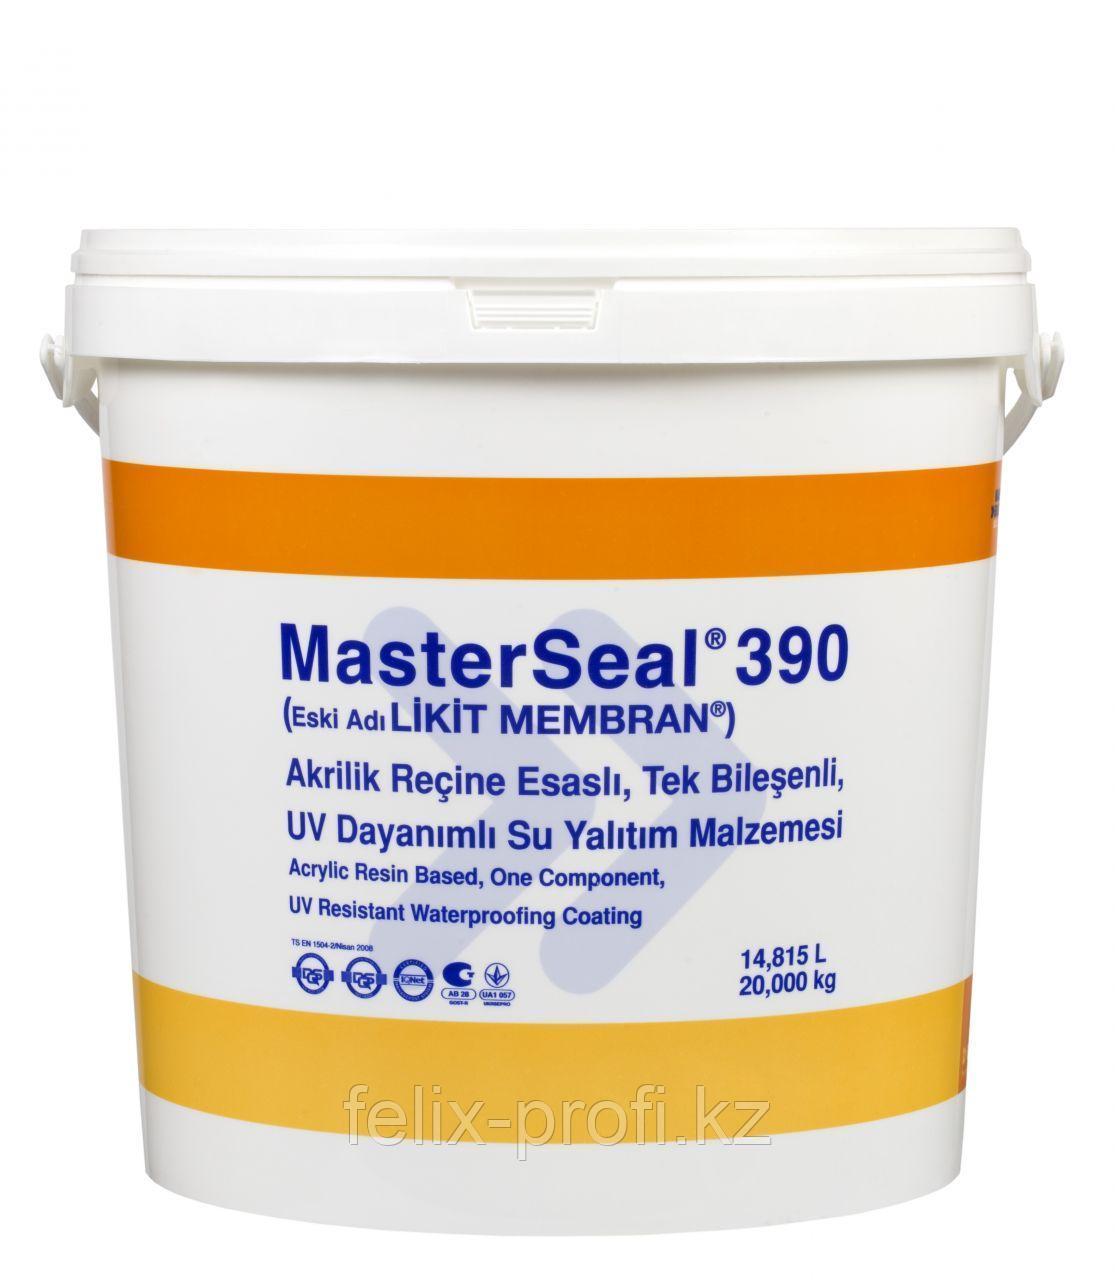 Masterseal 390 (Likit Membran), 20кг, водоизоляц. Мат-л